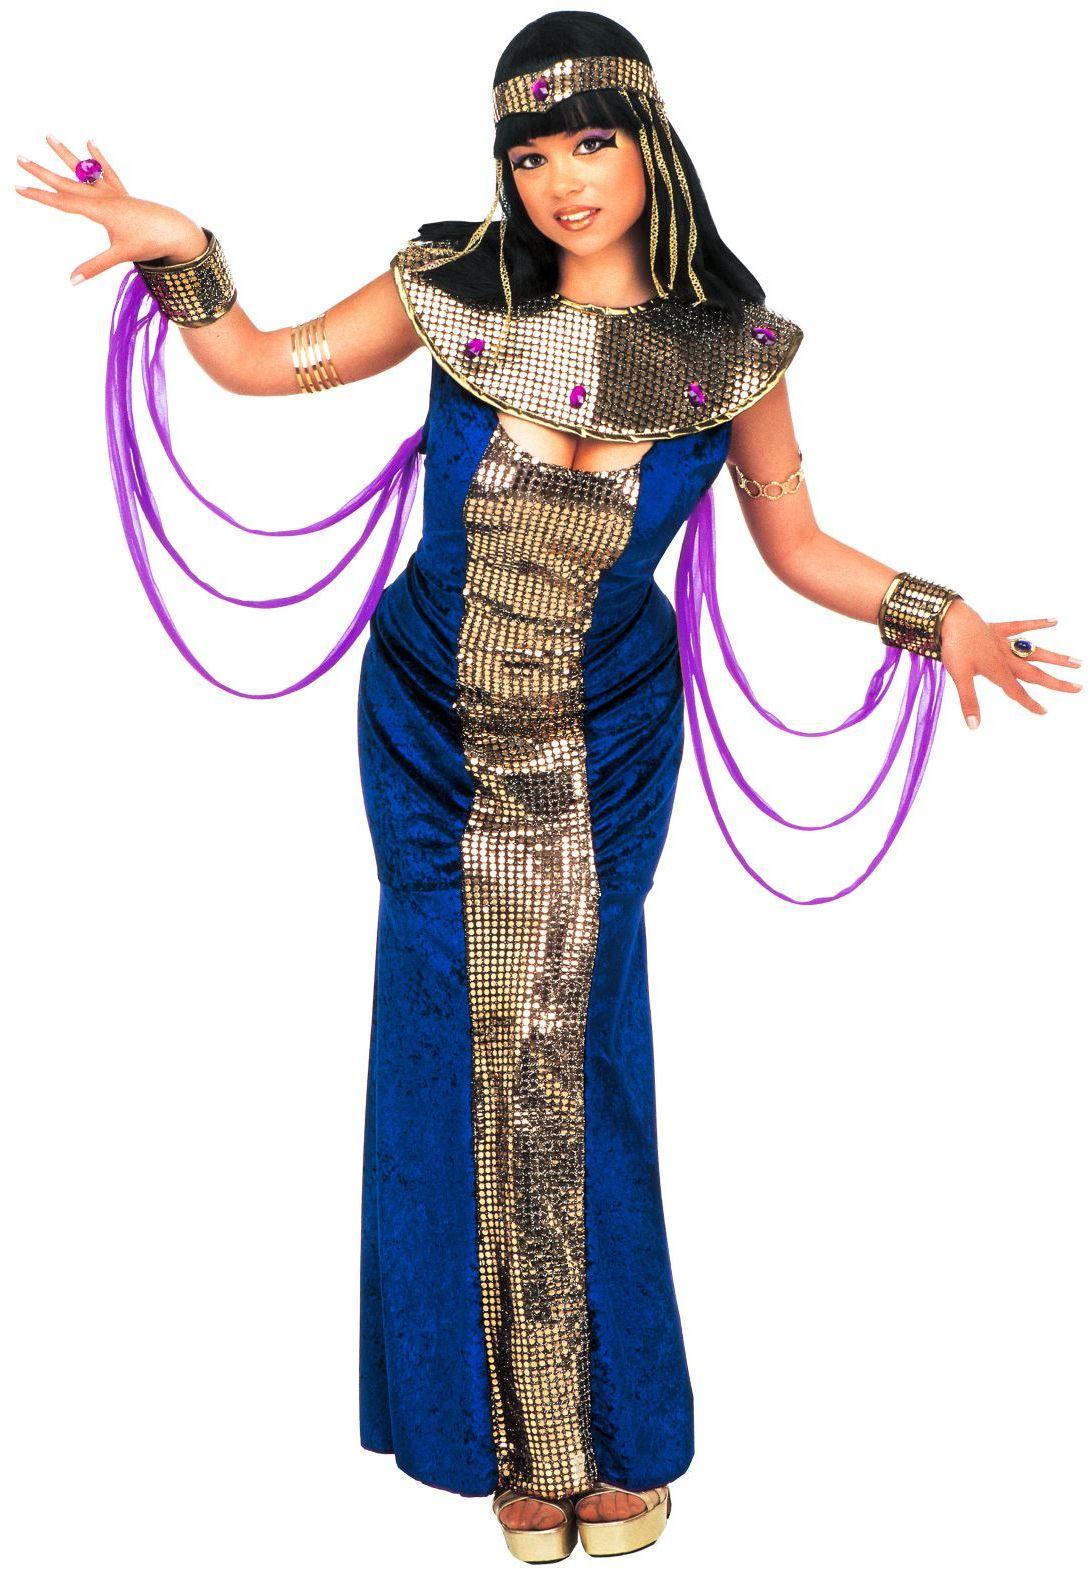 Cleopatra fluweel kostuum